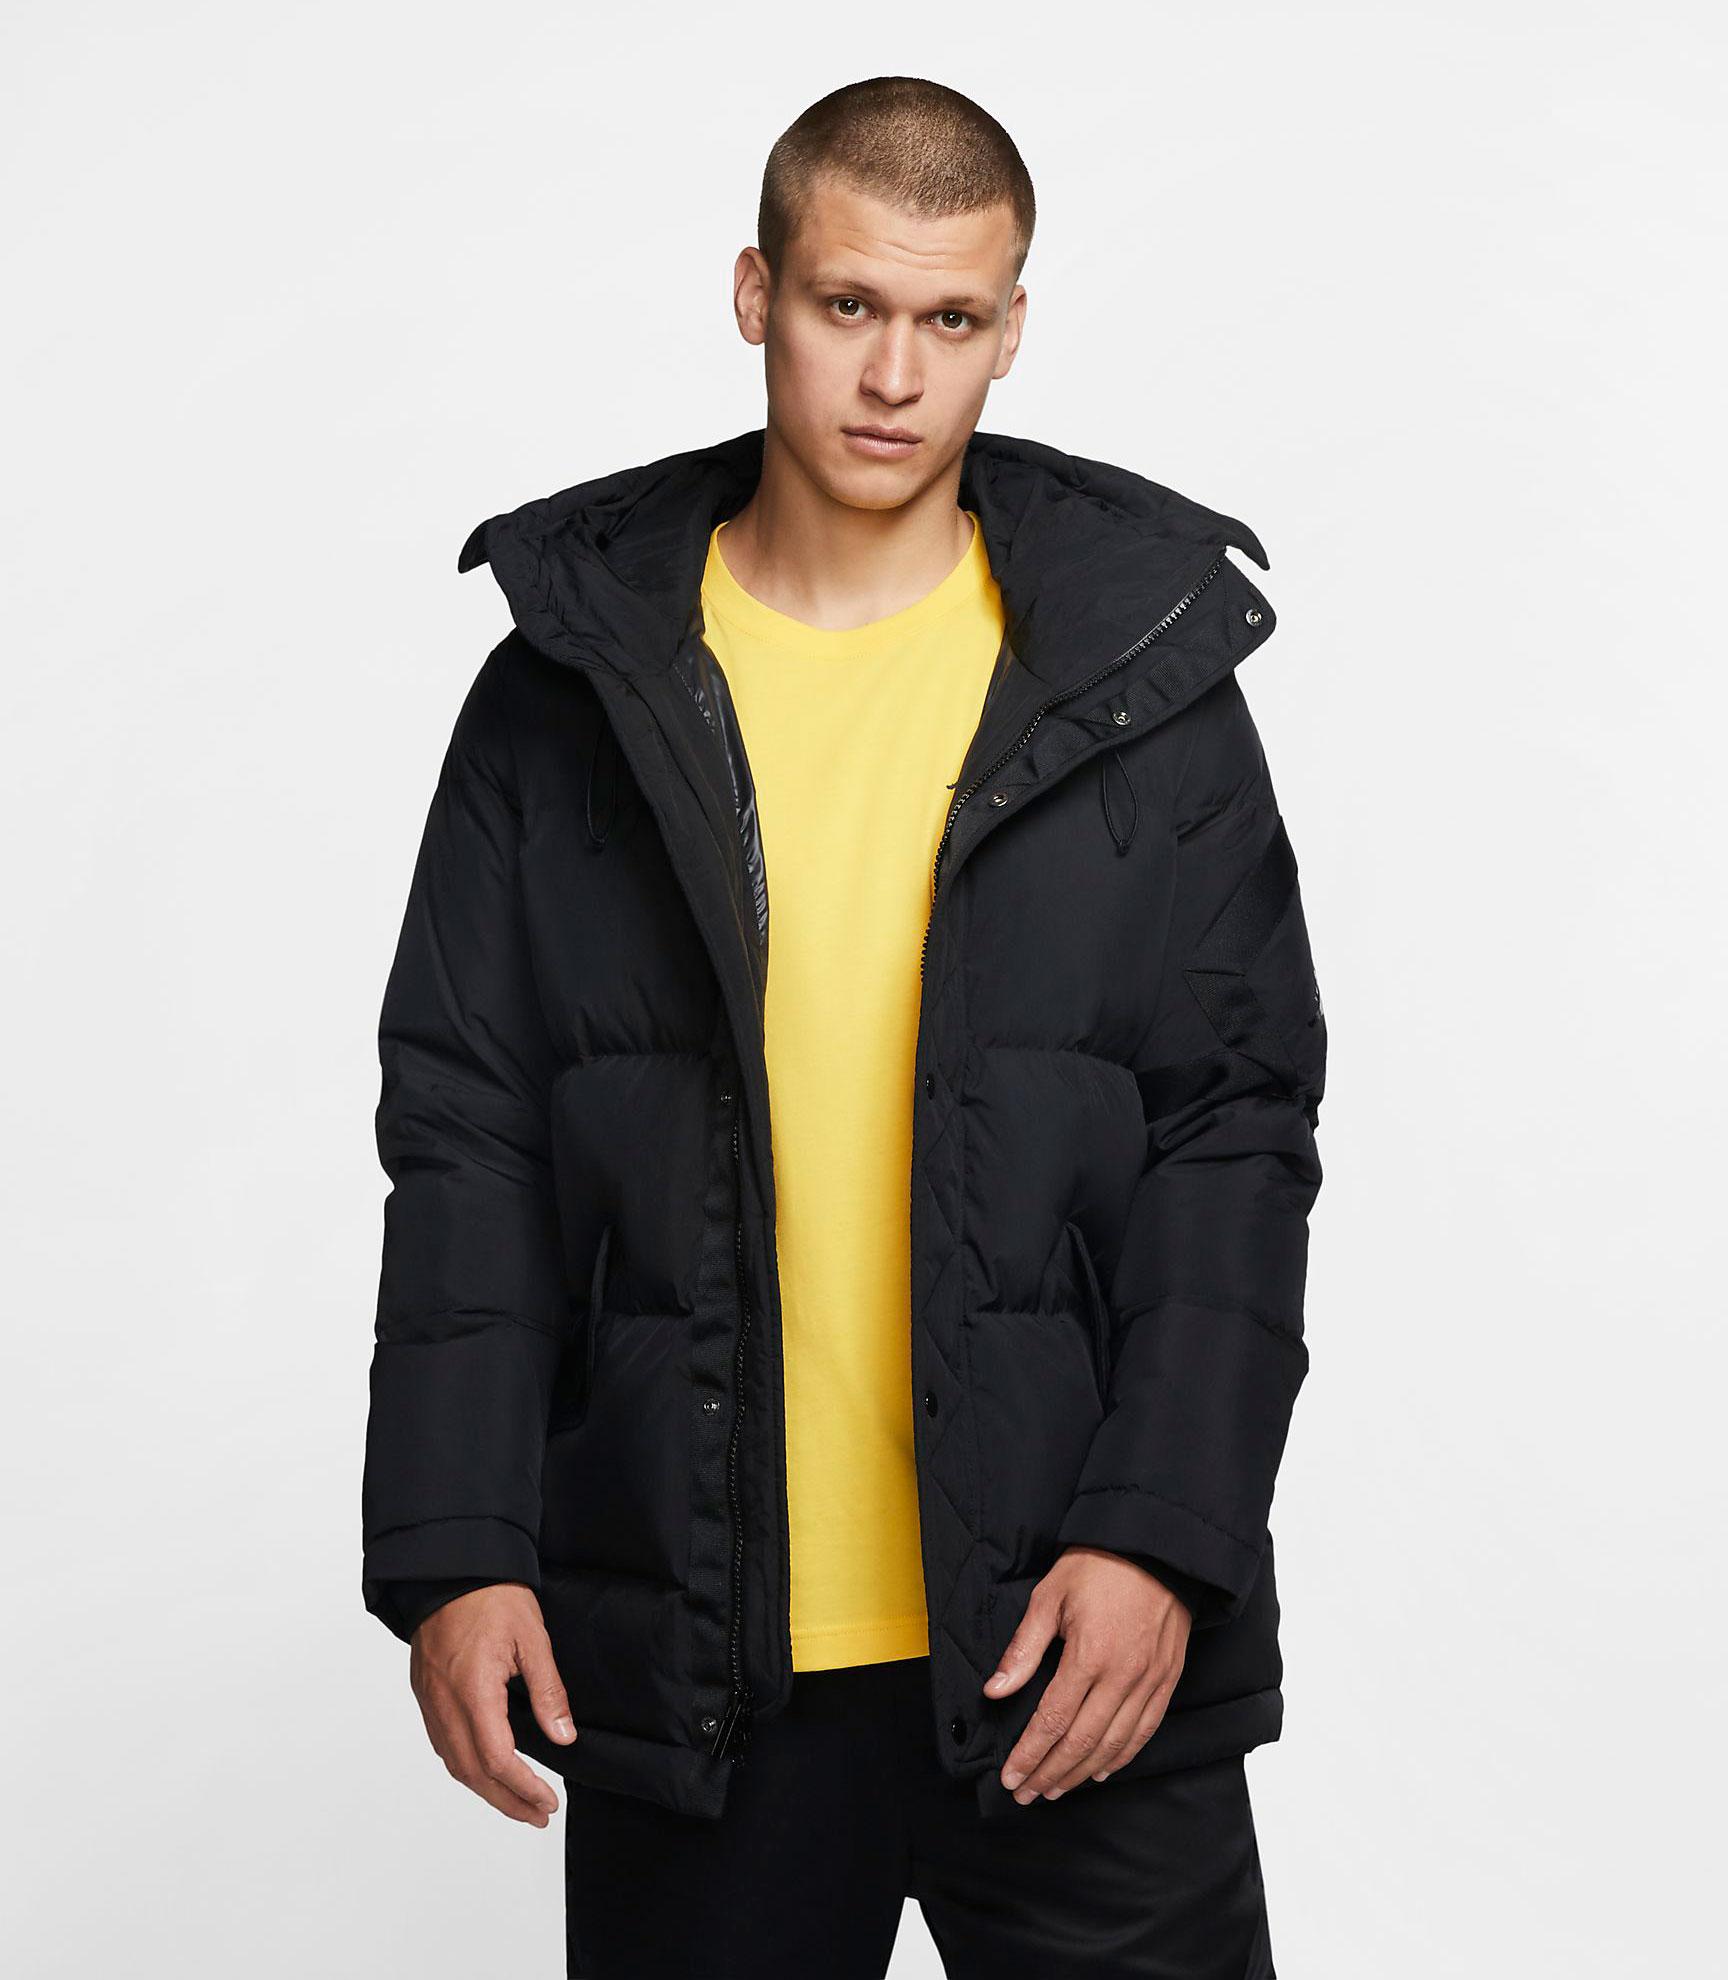 jordan-wings-down-parka-jacket-black-1